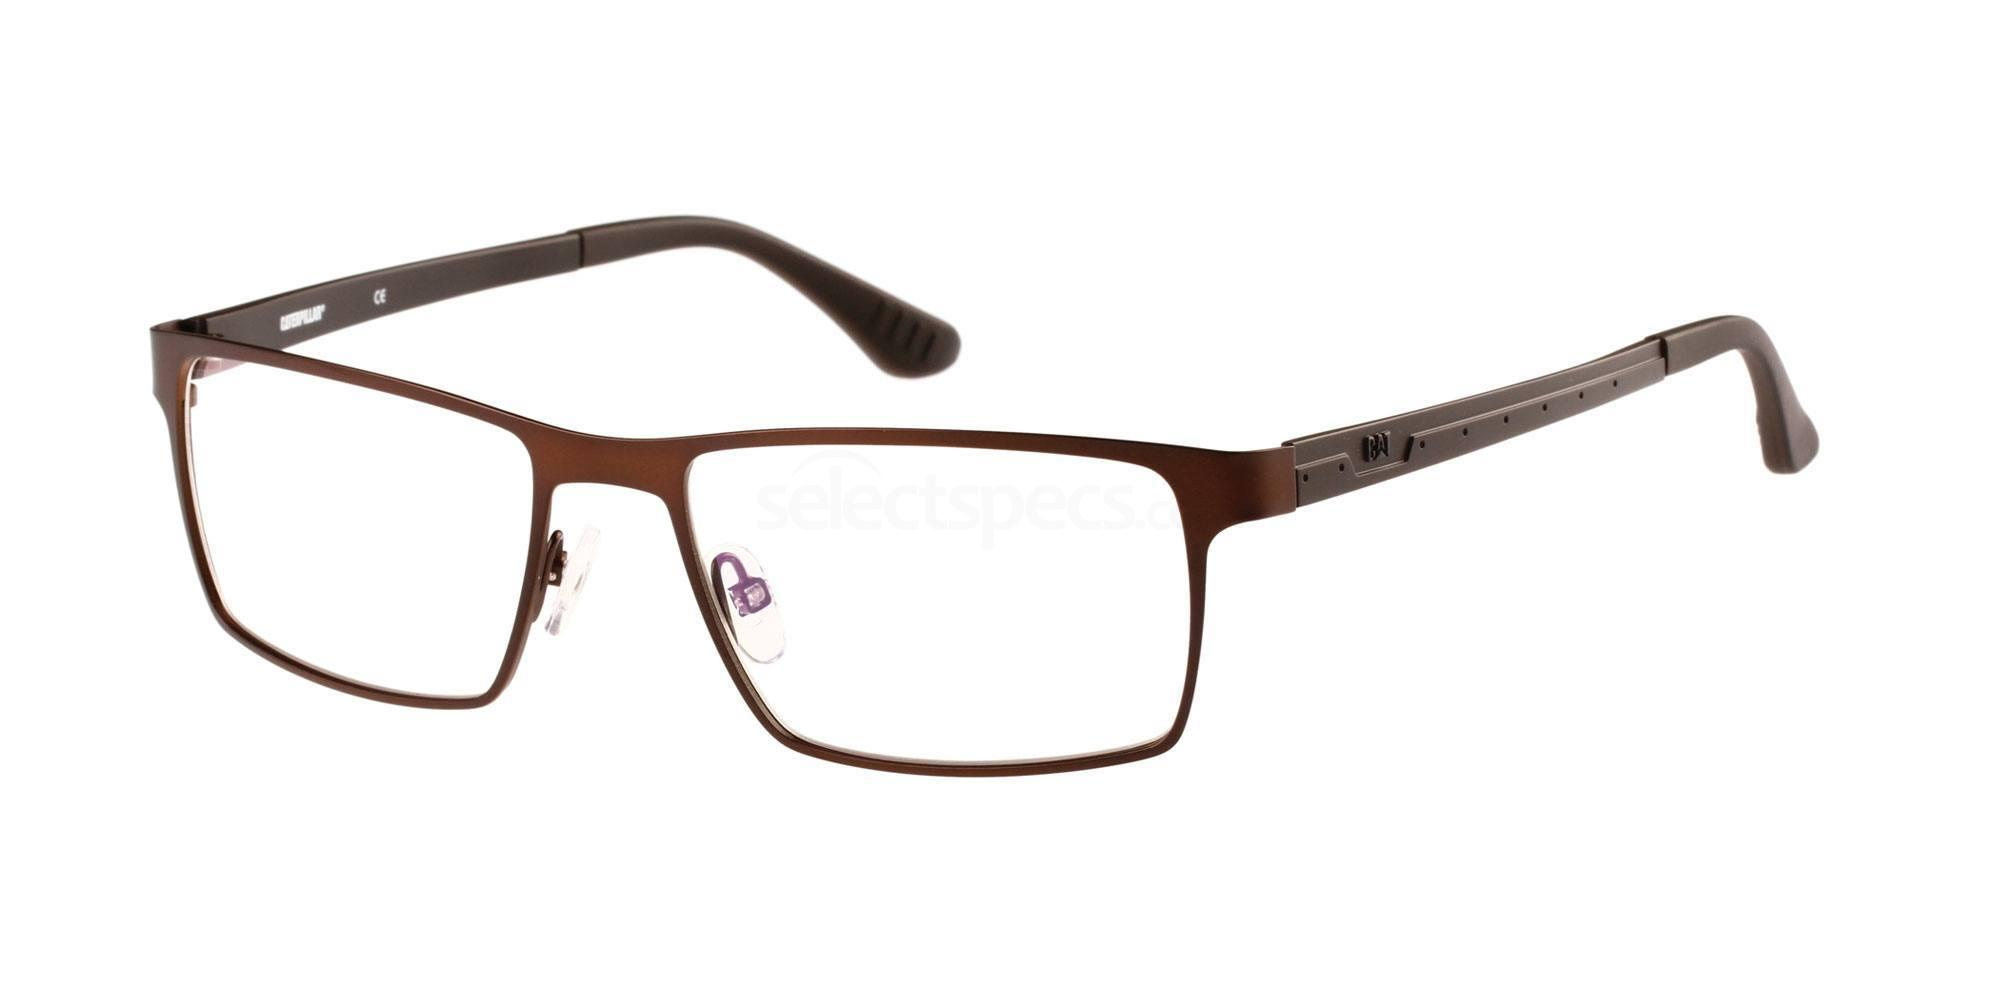 003 CTO J04 Glasses, CAT